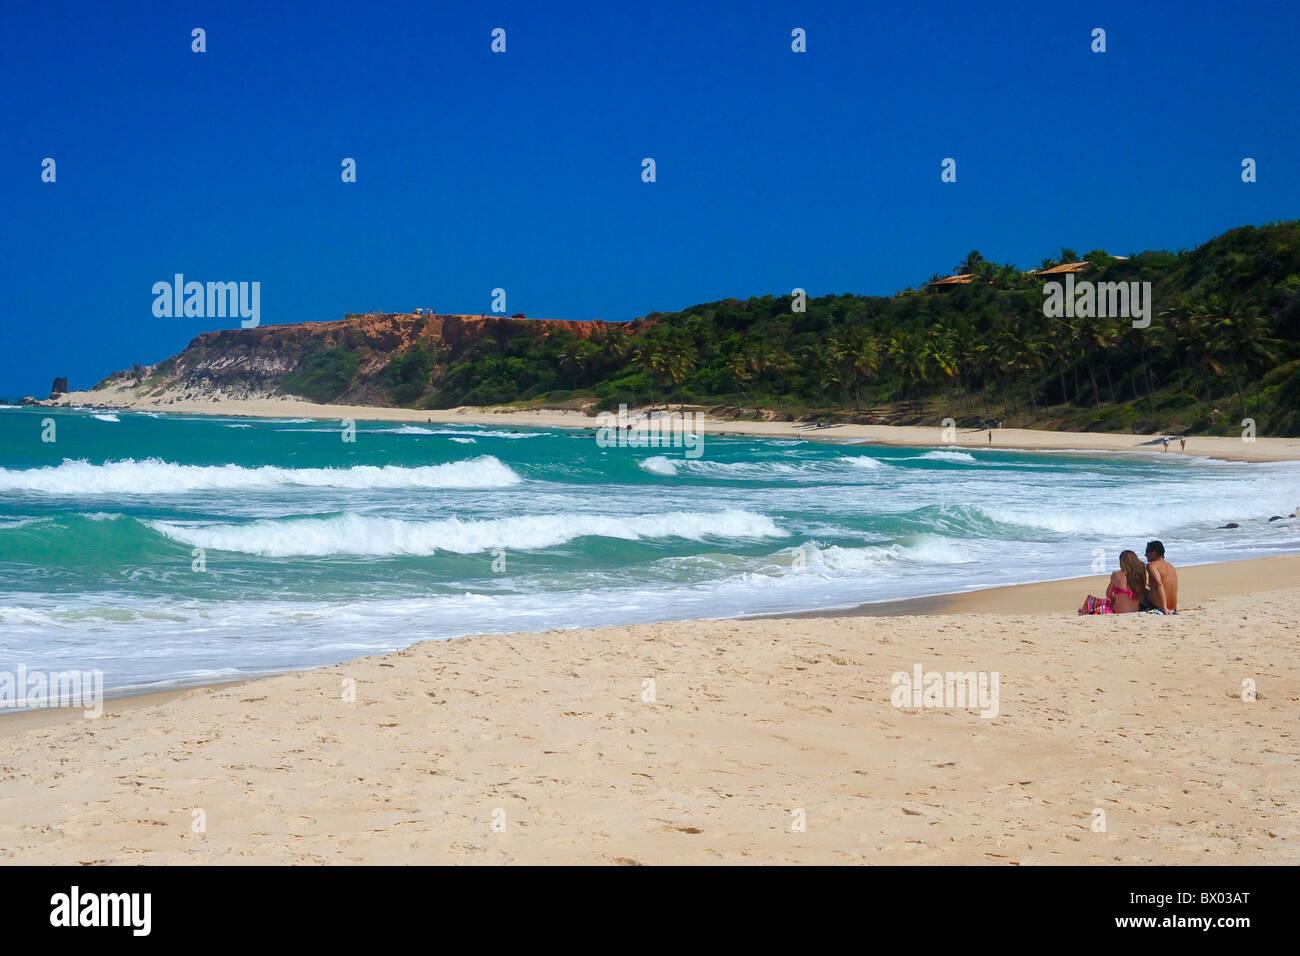 Pareja en Praia do Amor, Playa de Pipa, Brasil. Imagen De Stock